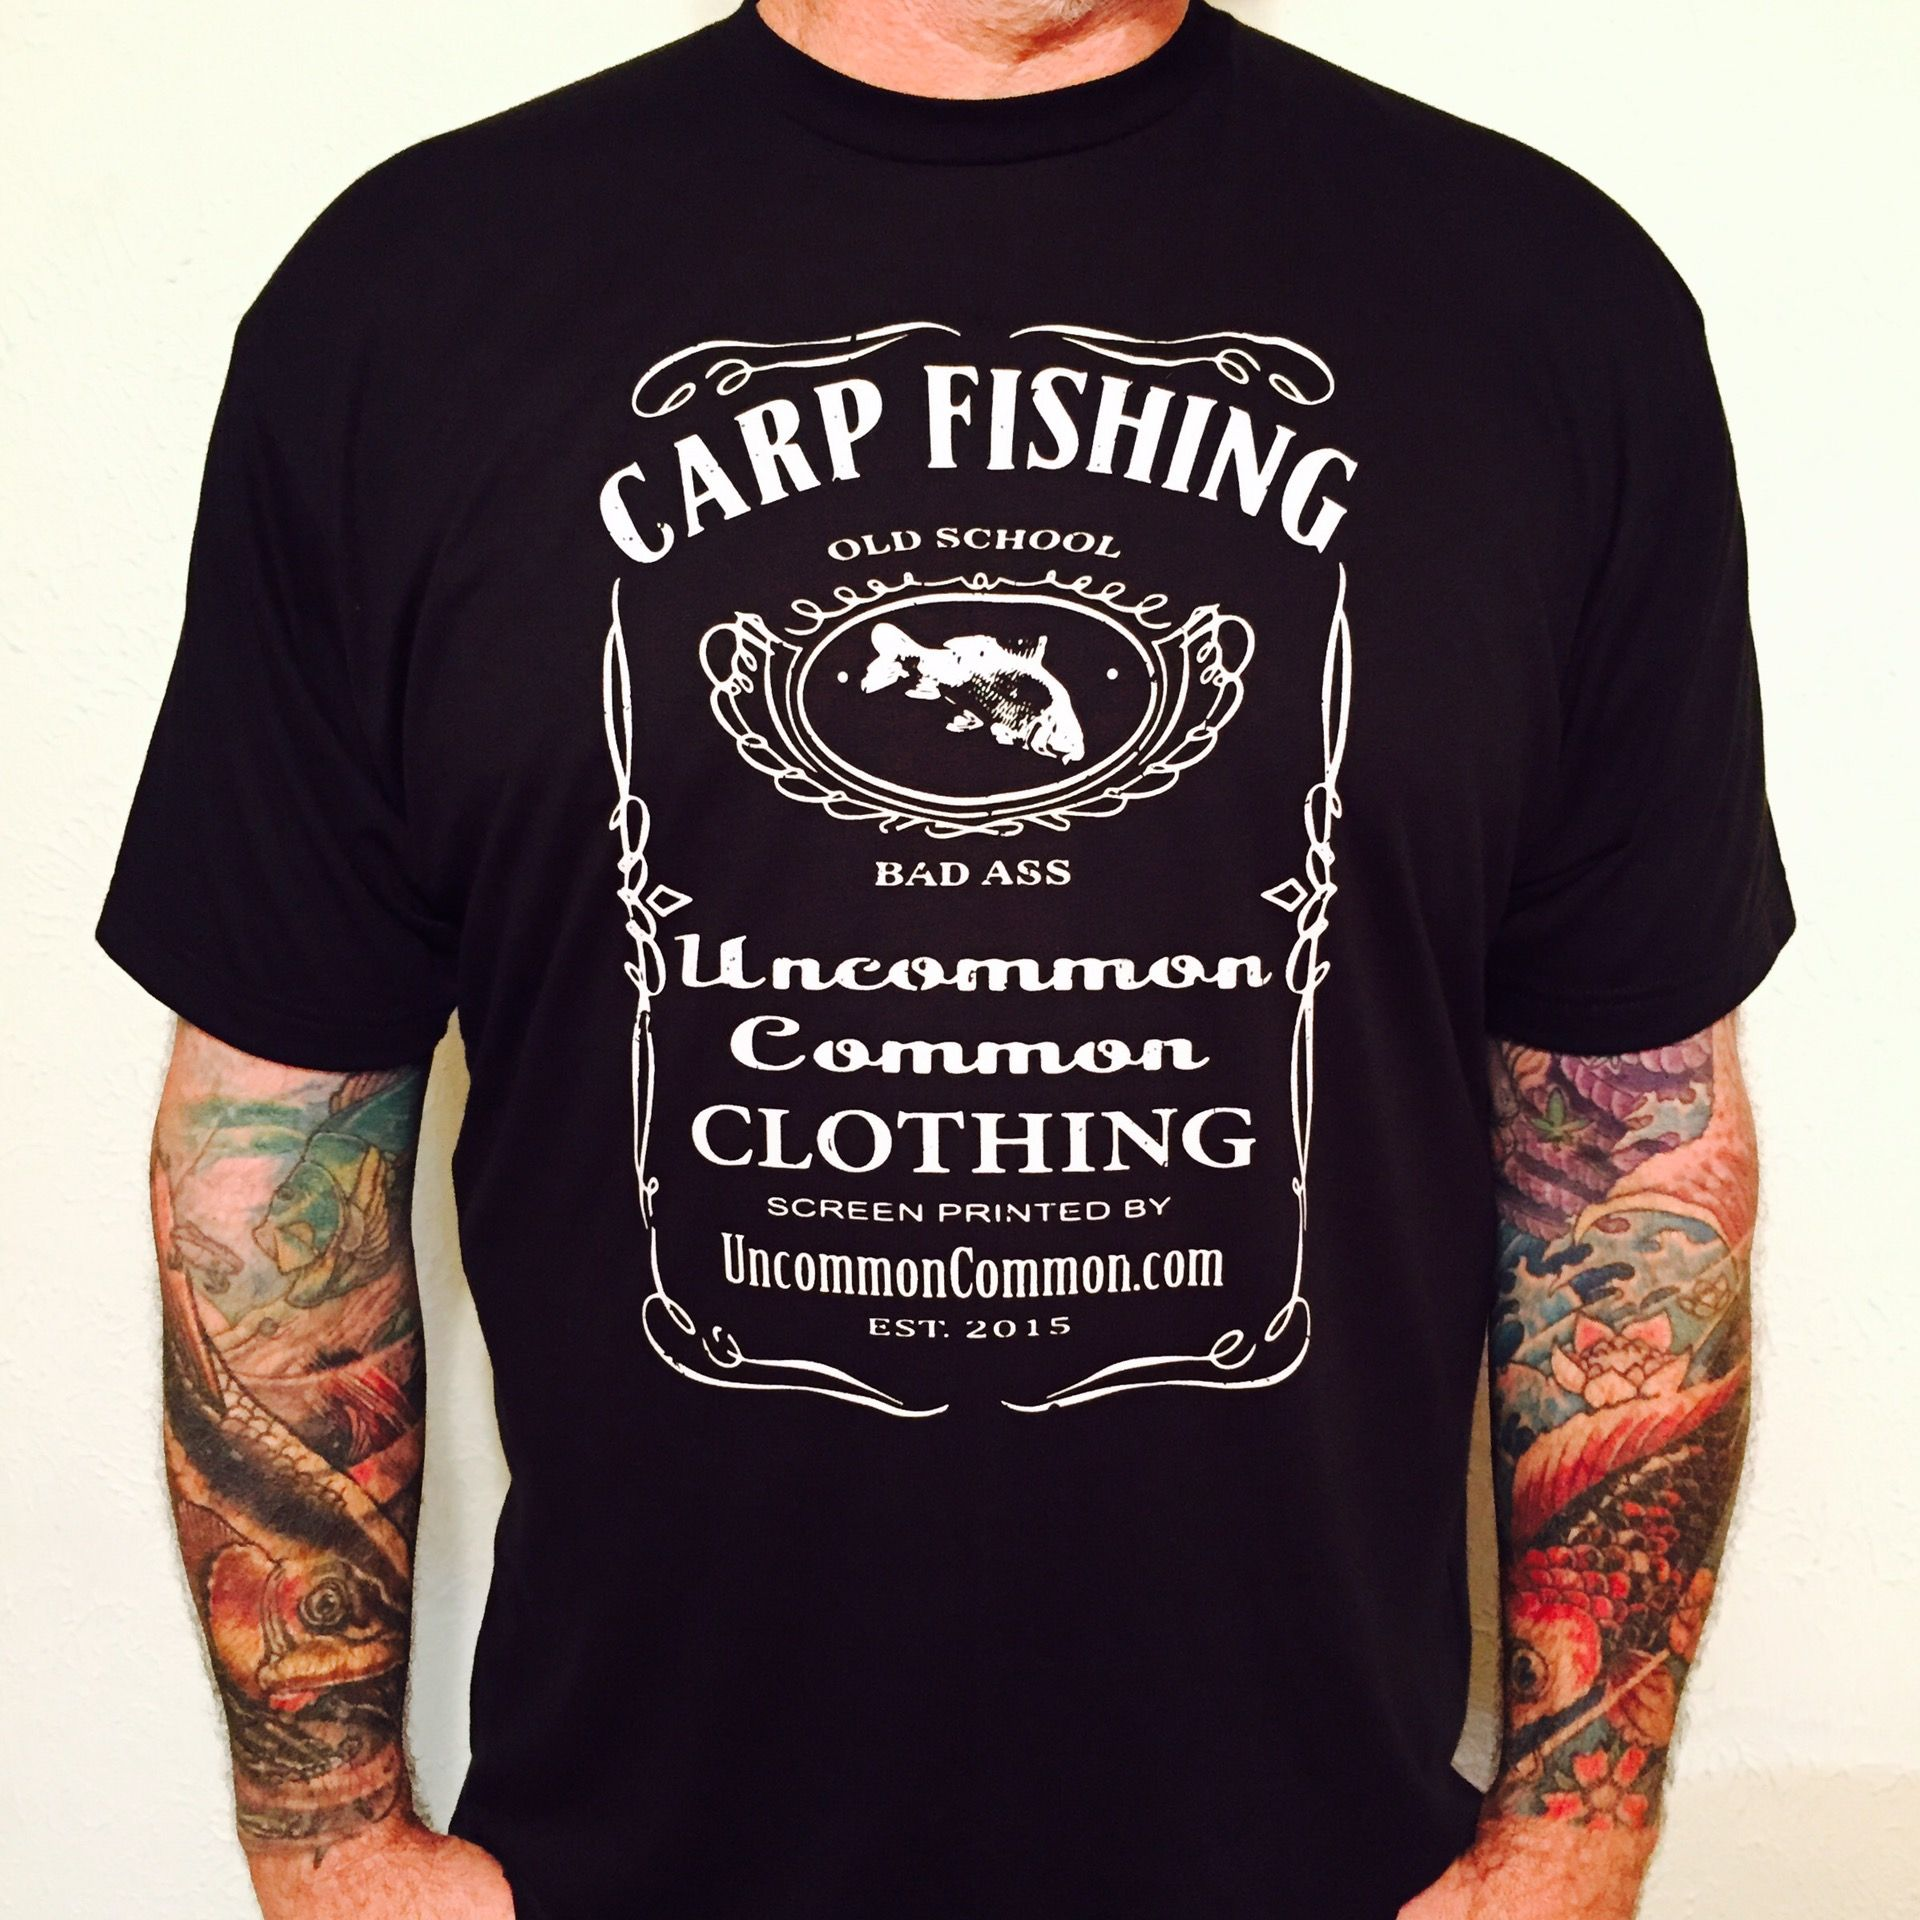 Carp Fishing Tee Shirt